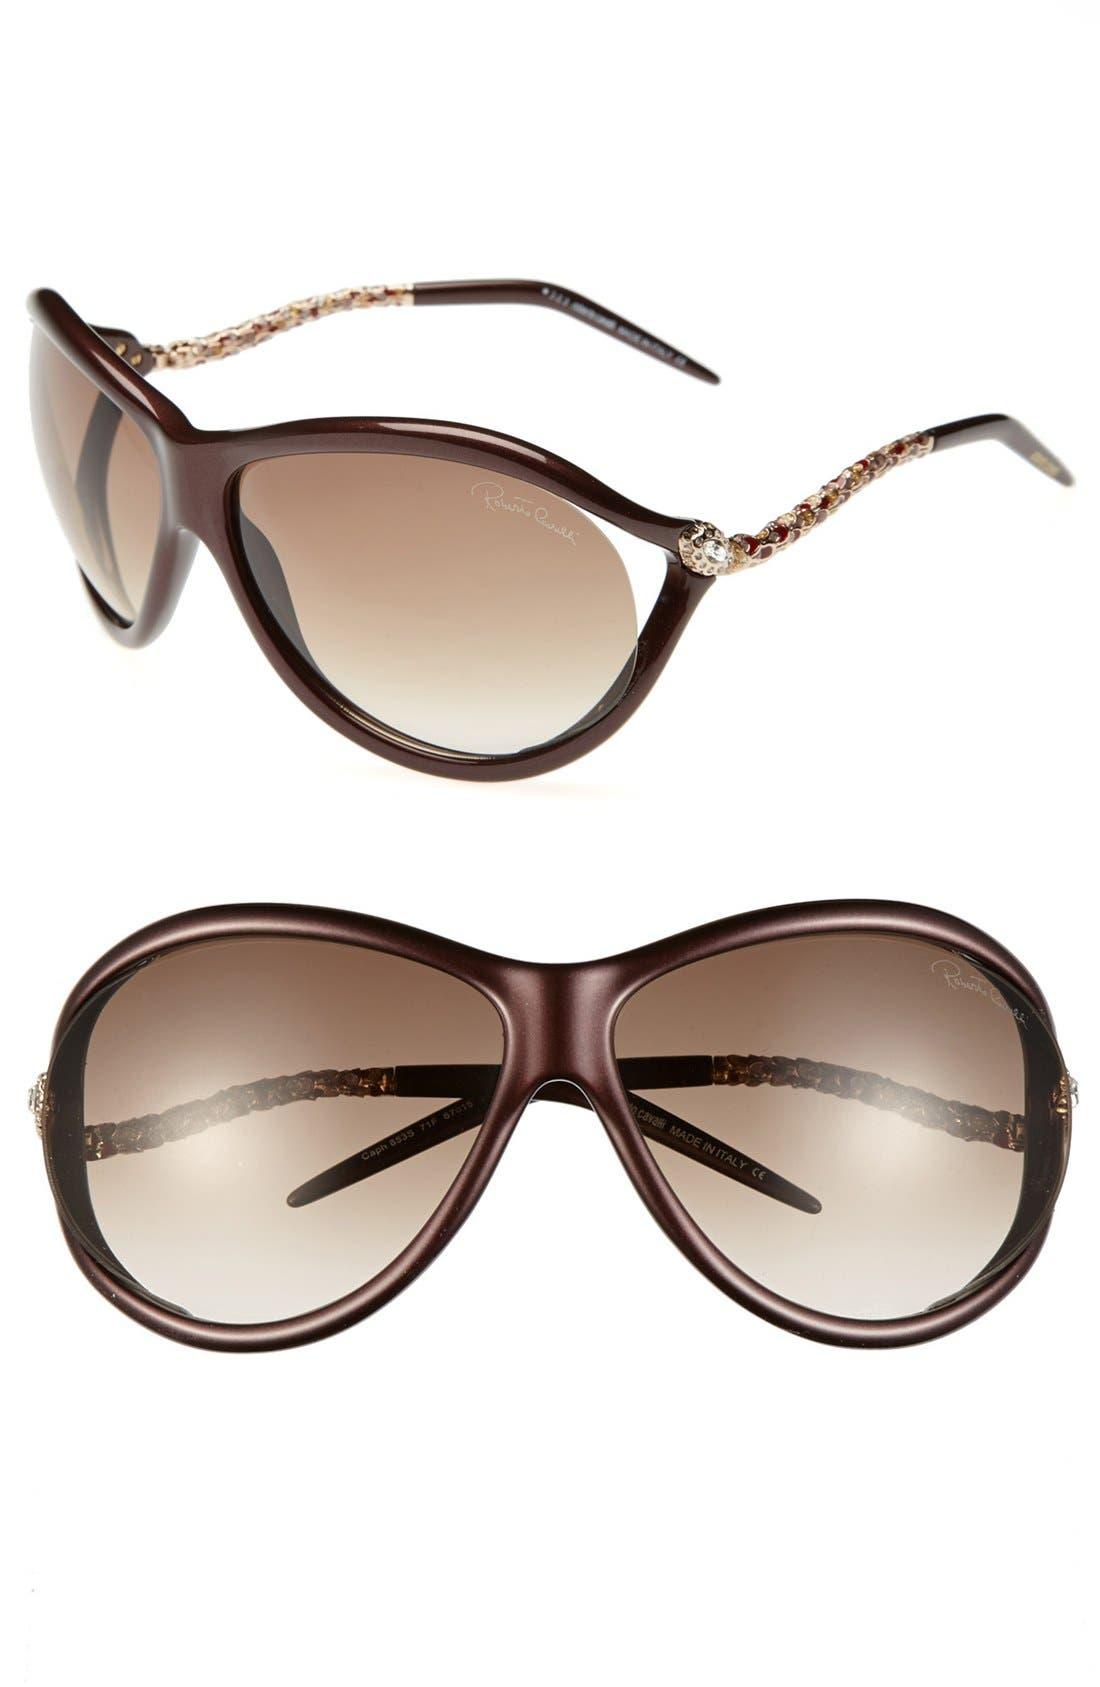 Main Image - Roberto Cavalli 'Caph' 67mm Enamel Detail Oversized Sunglasses